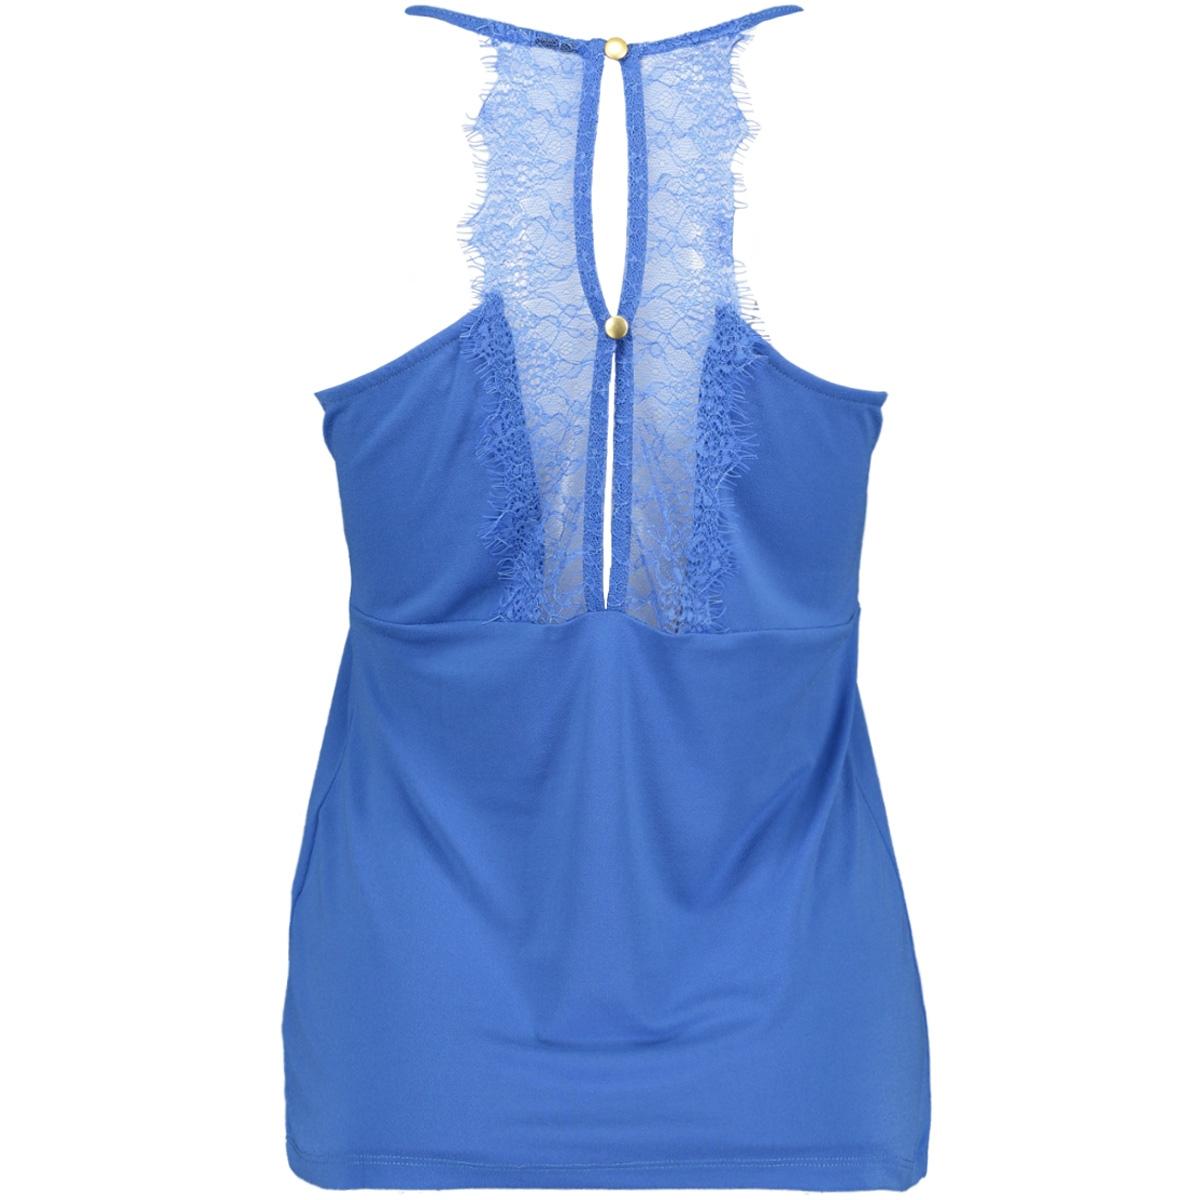 vmmilla s/l lace top color 10209420 vero moda top strong blue